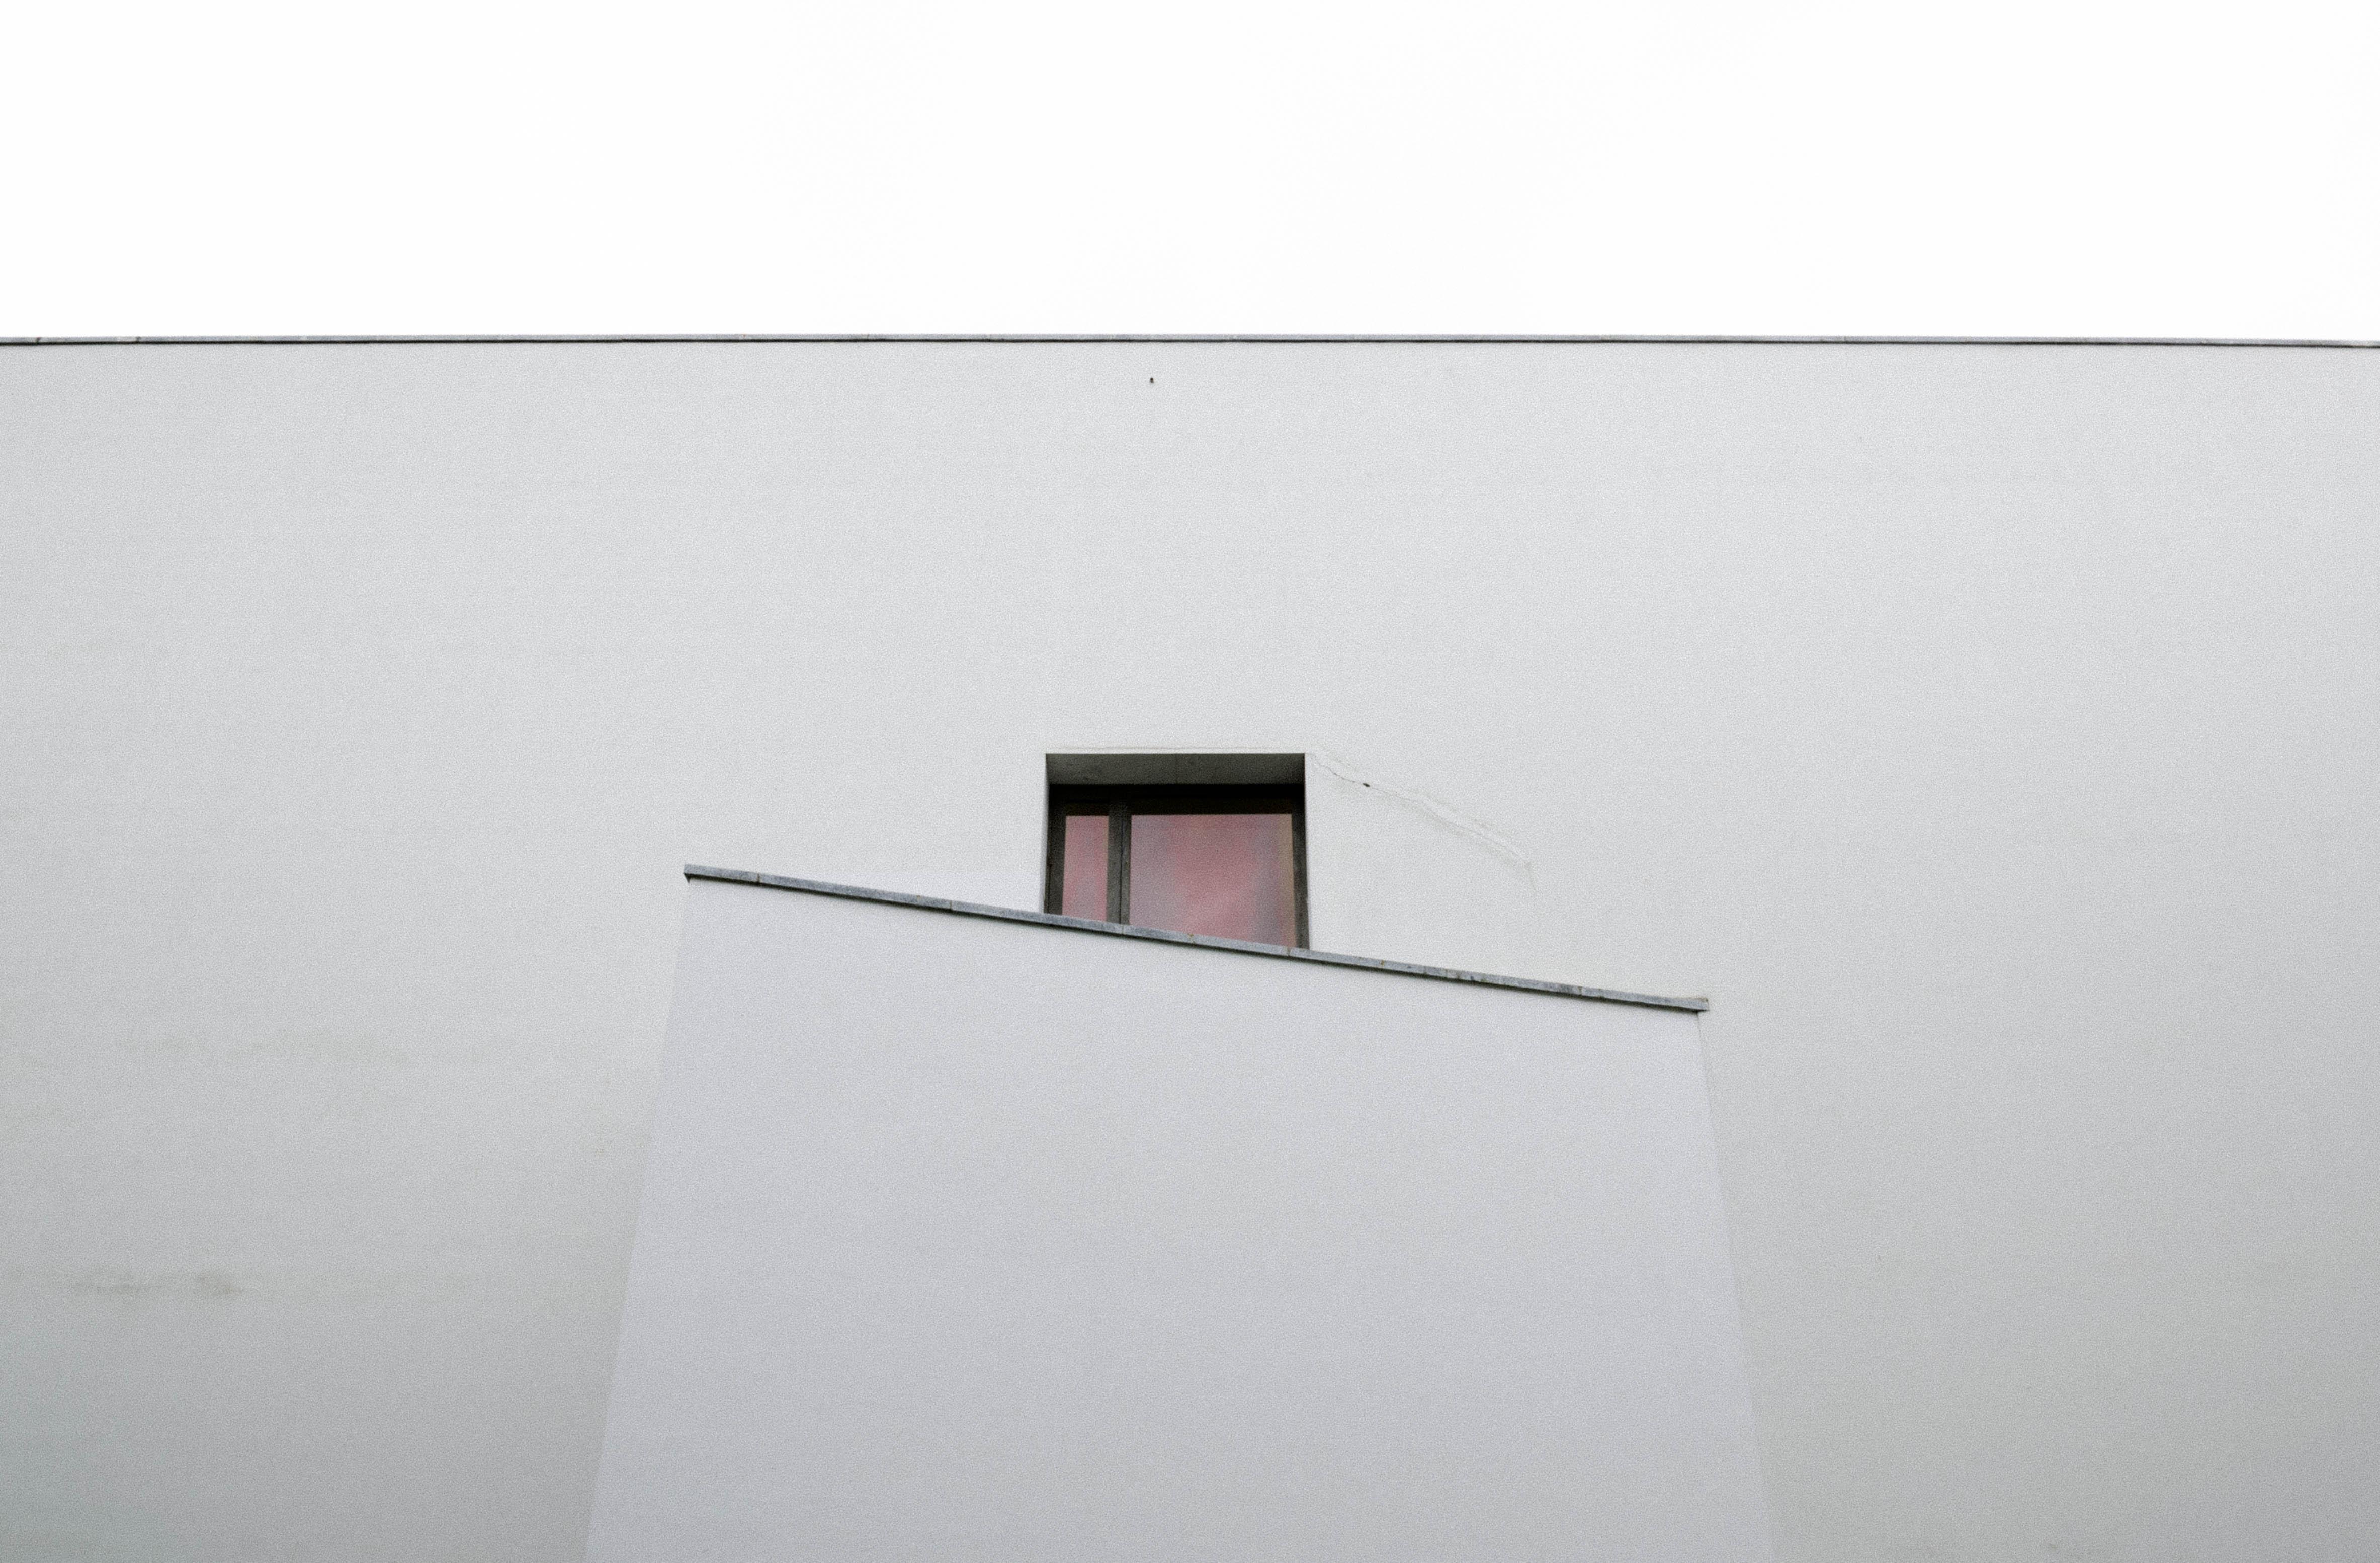 Sfondi : bianca minimalismo parete lampada mensola rettangolo